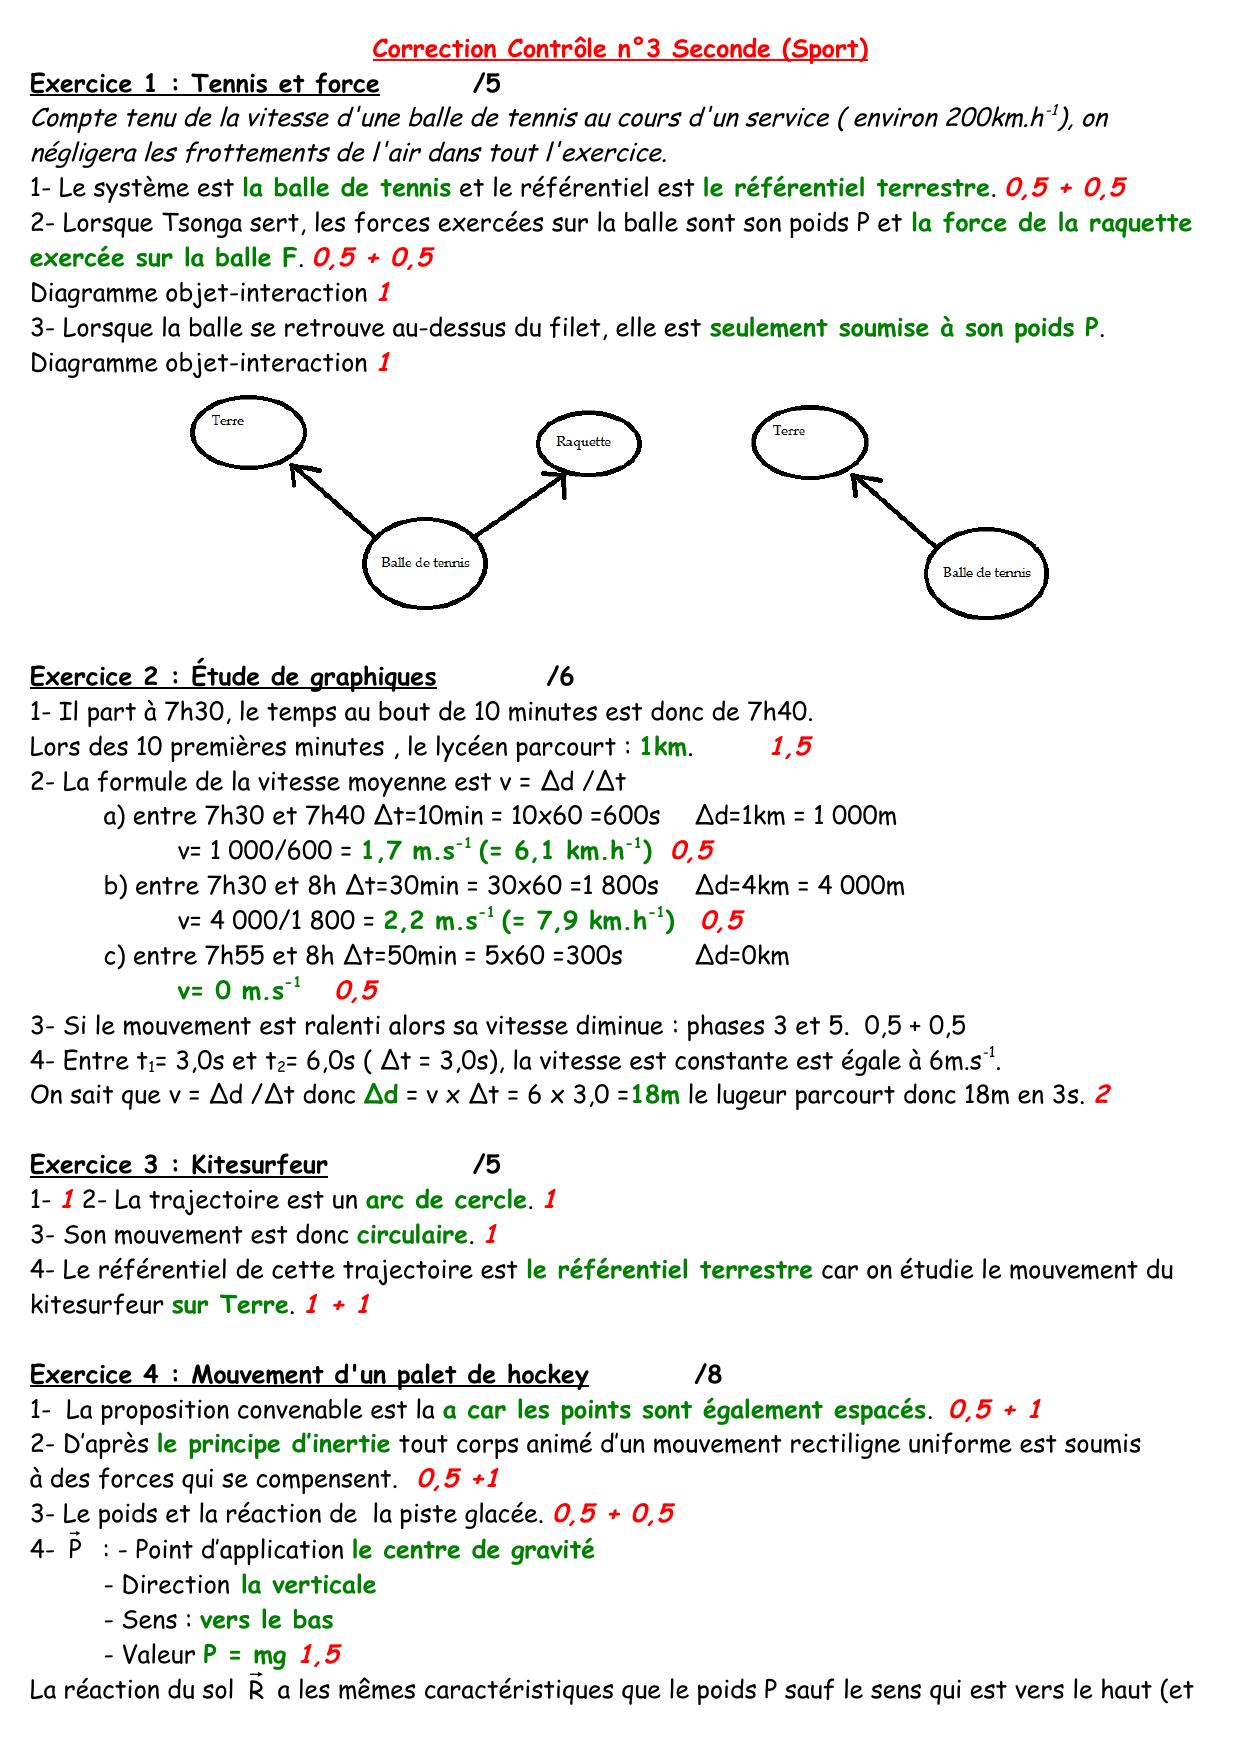 Correction Contrôle n°3 Seconde (Sport) Exercice 1 ...